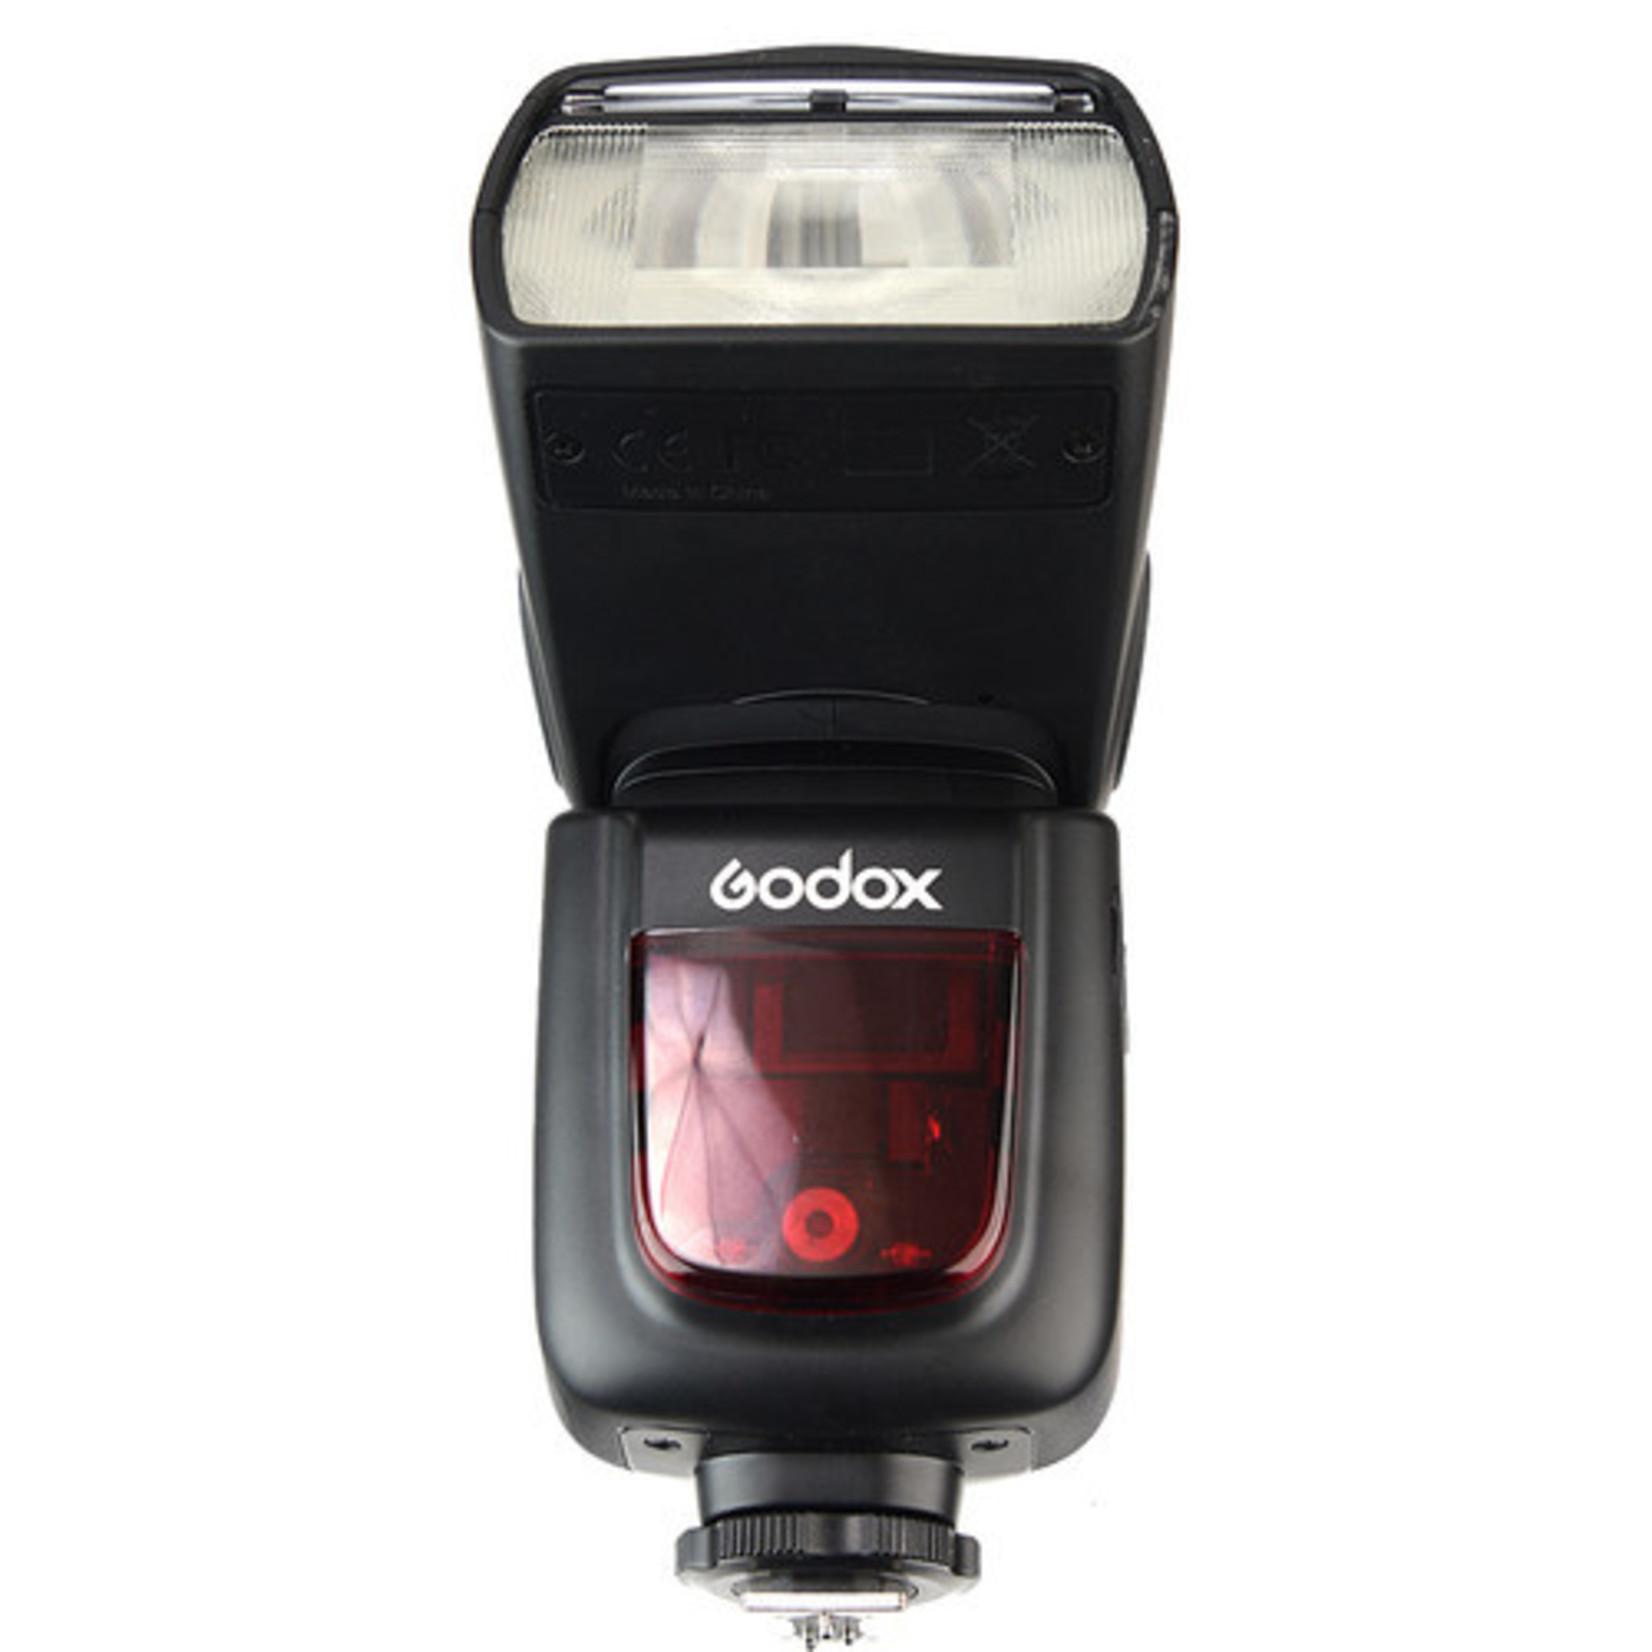 Godox GodoxVING V860 II Li-Ion Flash for Fuji